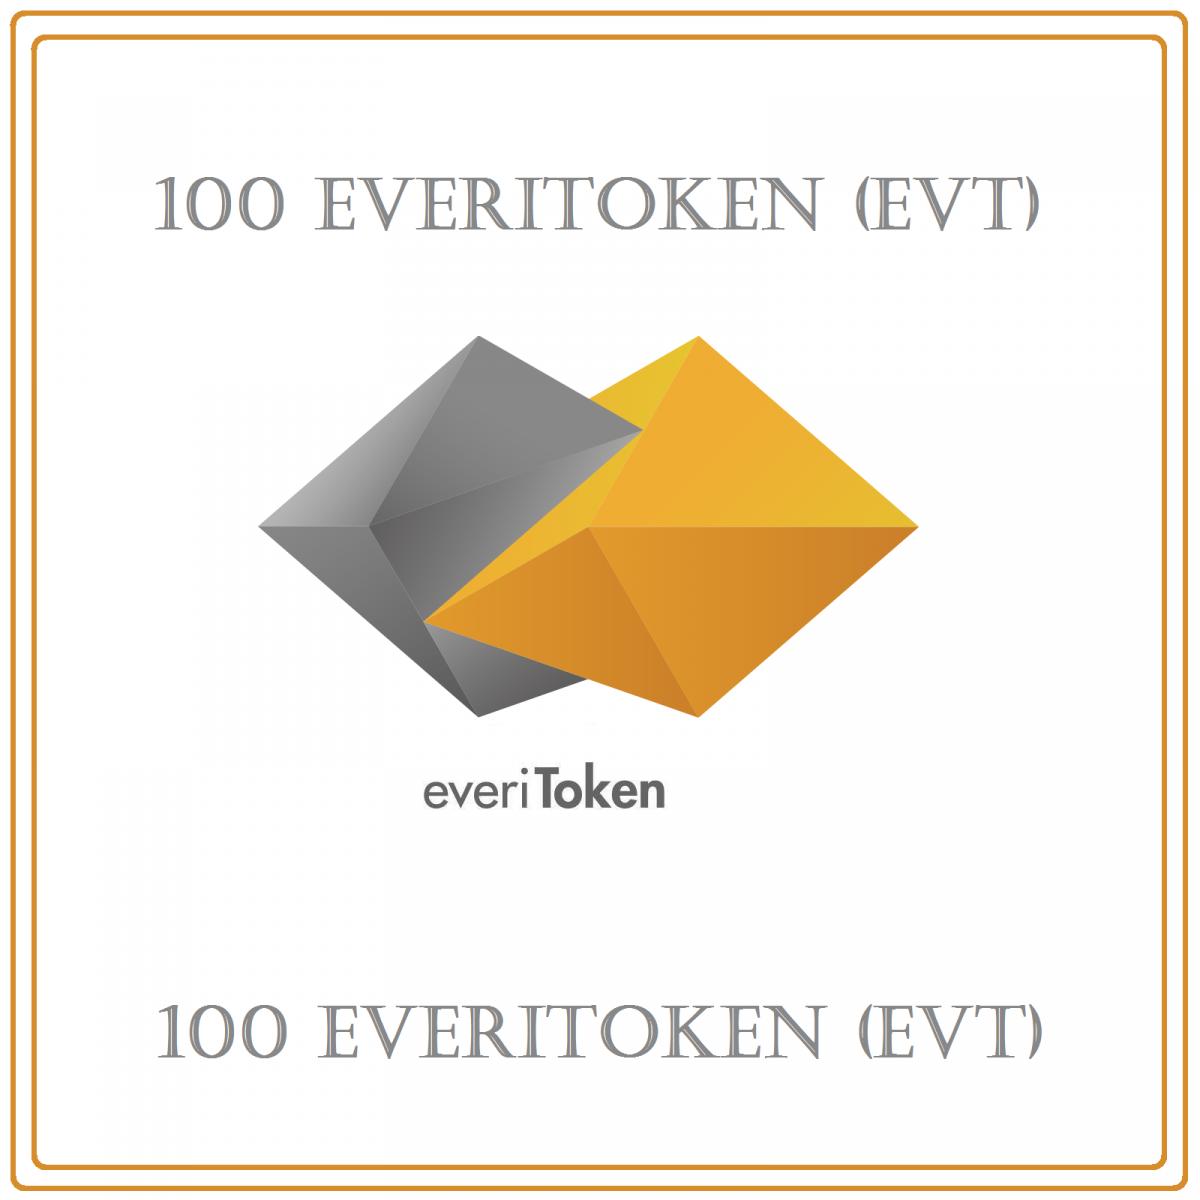 100 EveriToken (EVT) Mining Contract